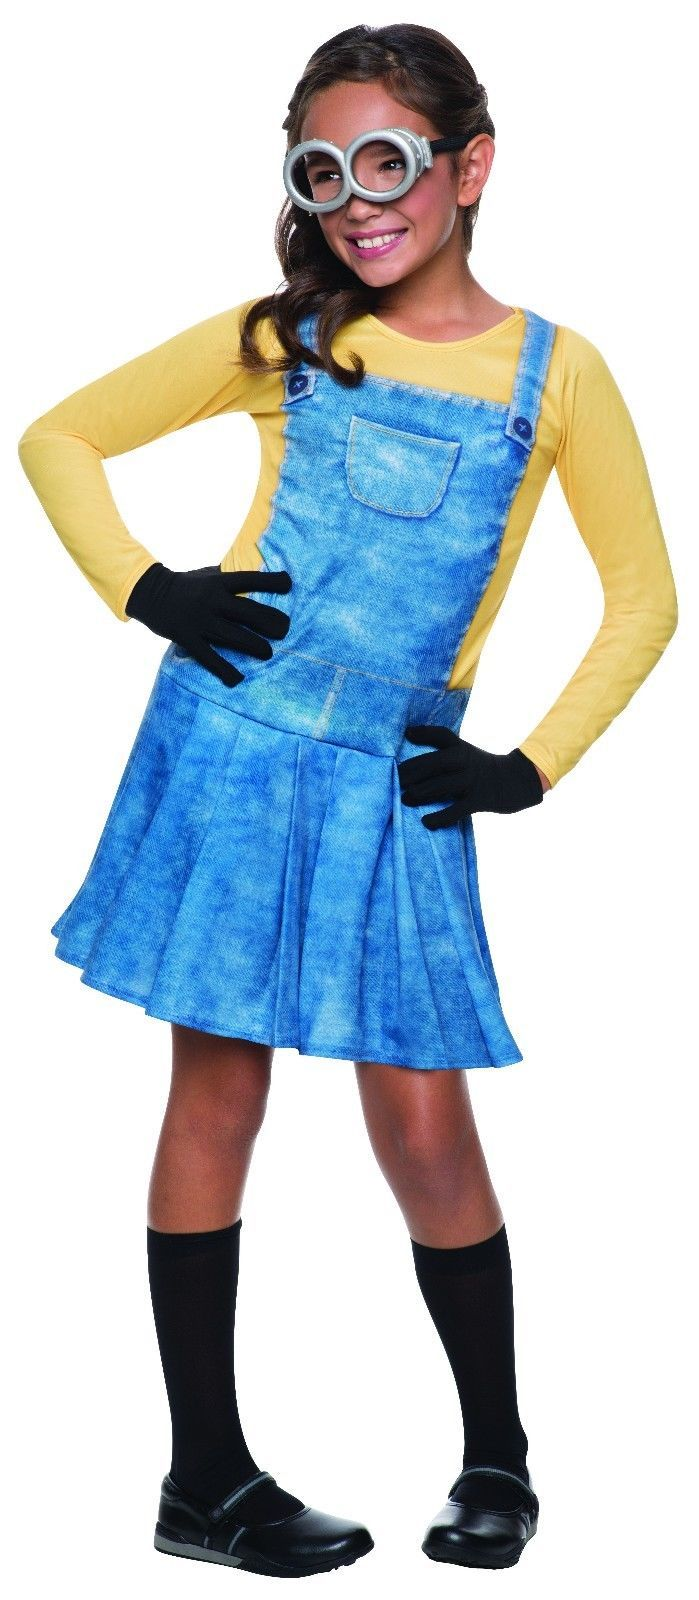 Rubies Mujer Minion Kevin Bob Stuart Niños Niñas Disfraz Halloween 610786